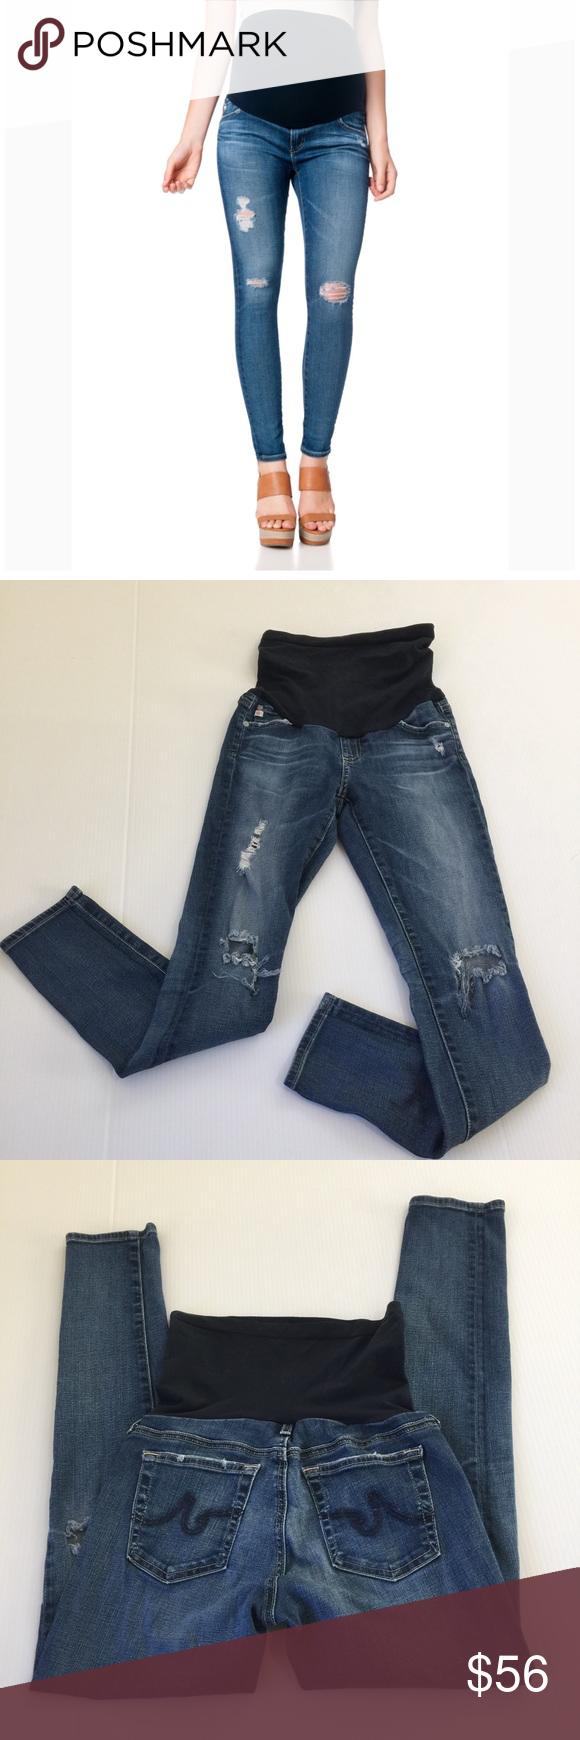 9c8c04764b068 AG Legging Ankle Secret Belly Maternity Jeans, 27 AG Adriano Goldshmied  Legging Ankle Pea in